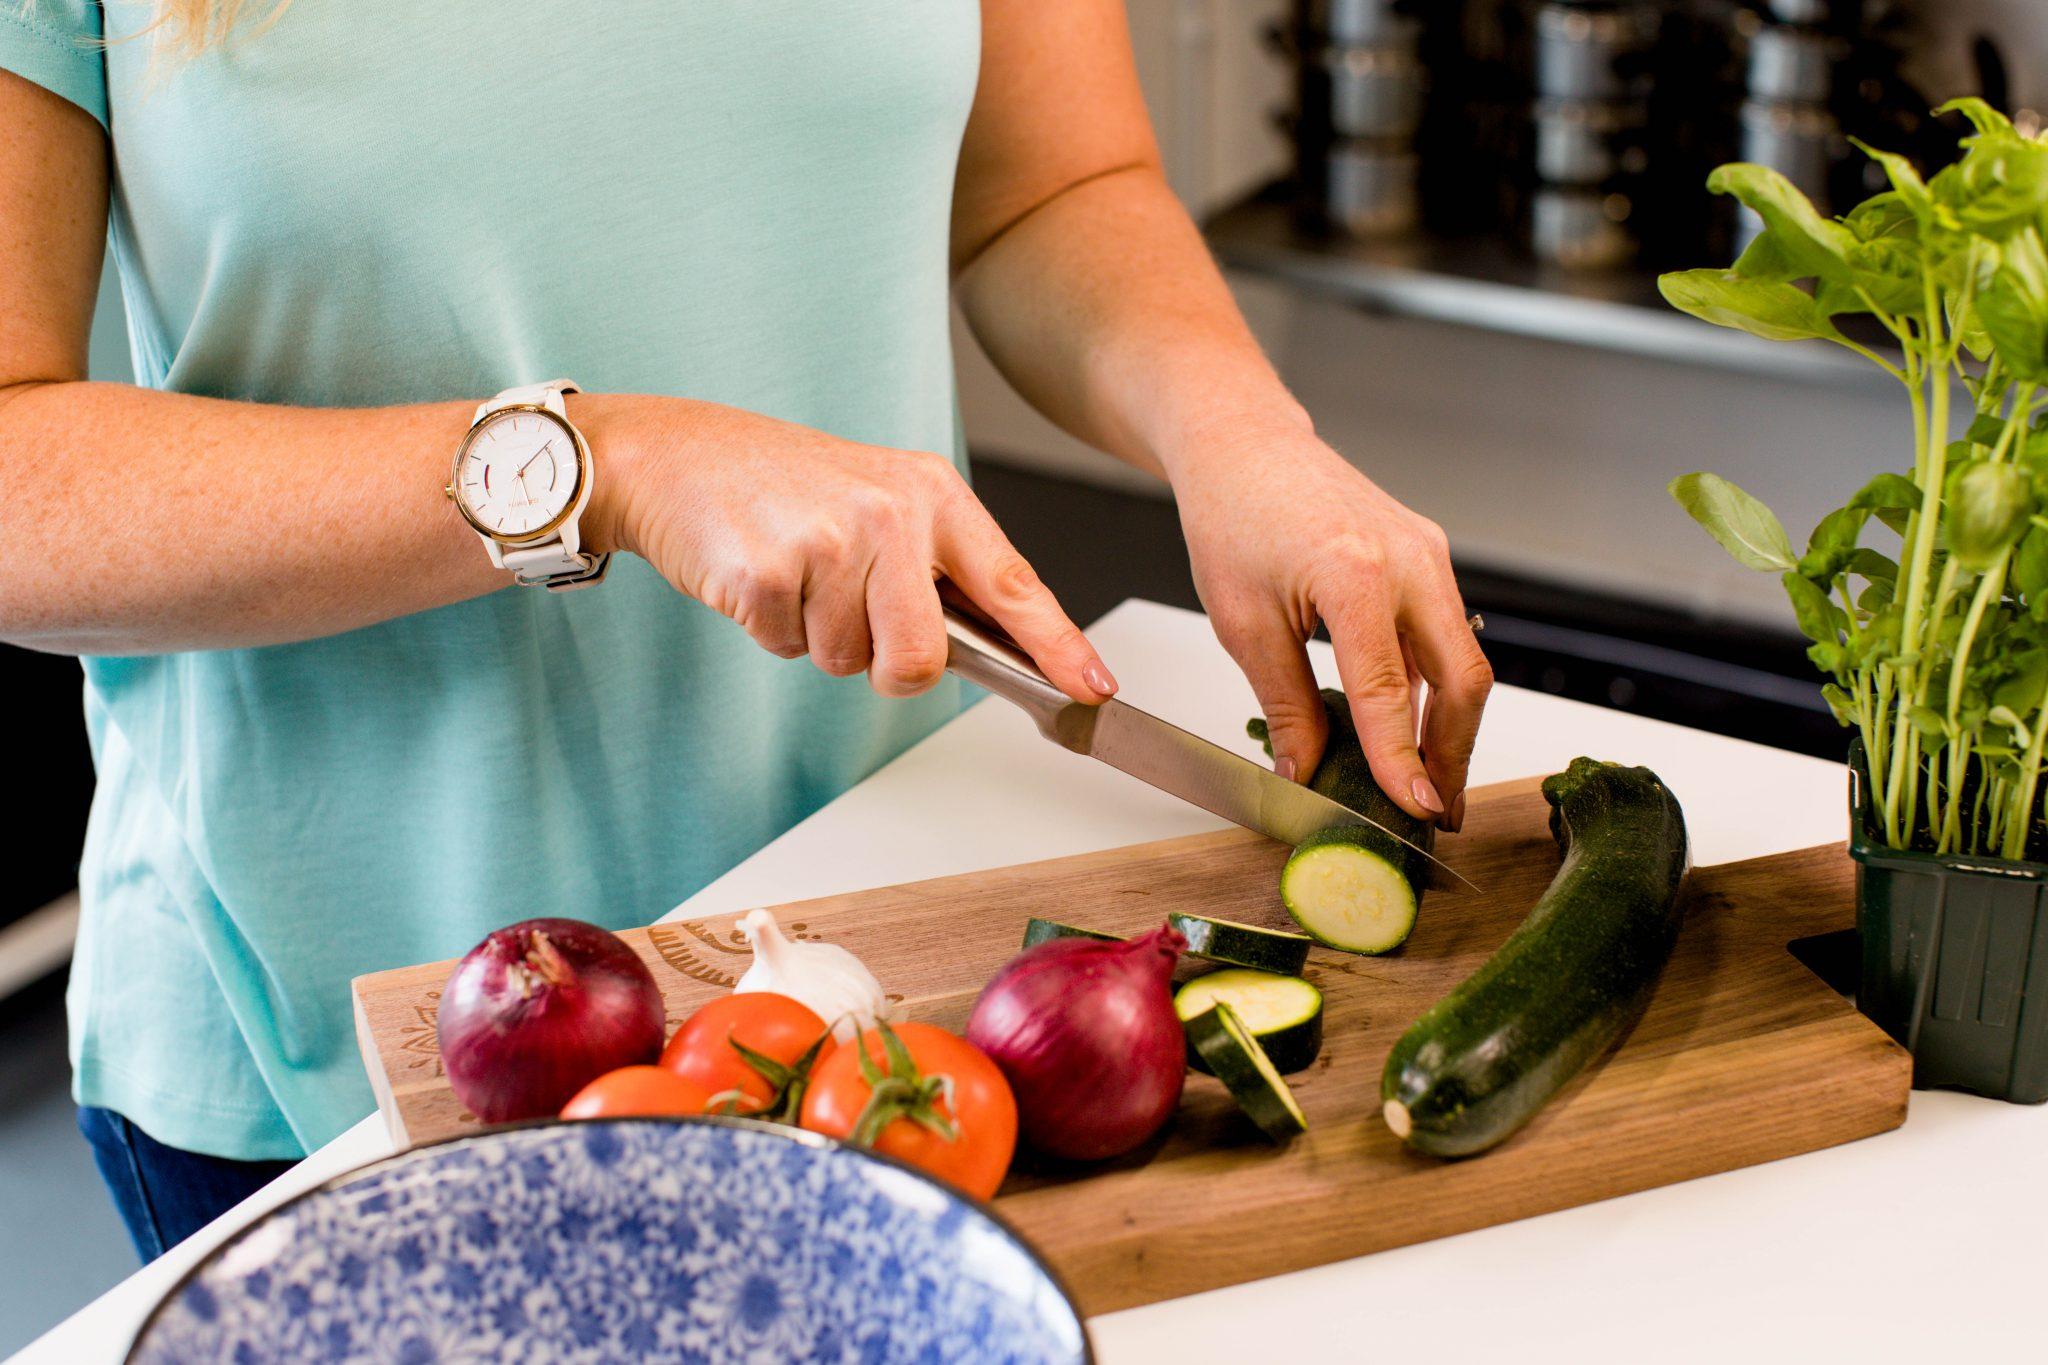 female hands chopping veg